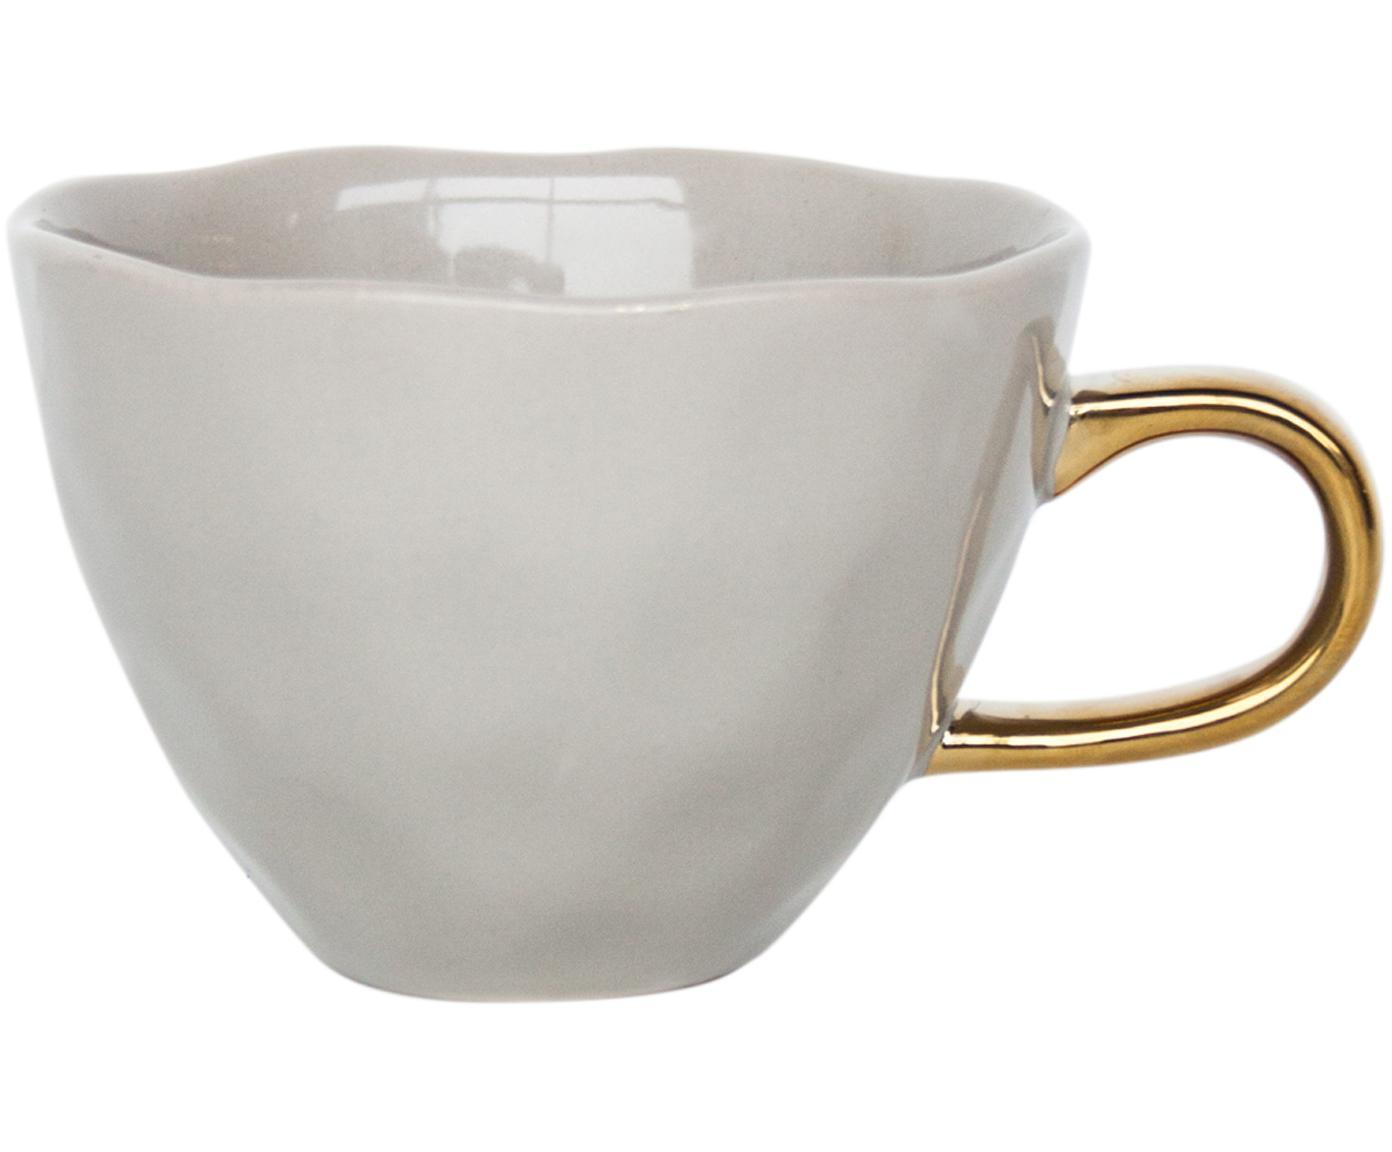 Taza de café Good Morning, Gres, Gris, dorado, Ø 11 x Al 8 cm